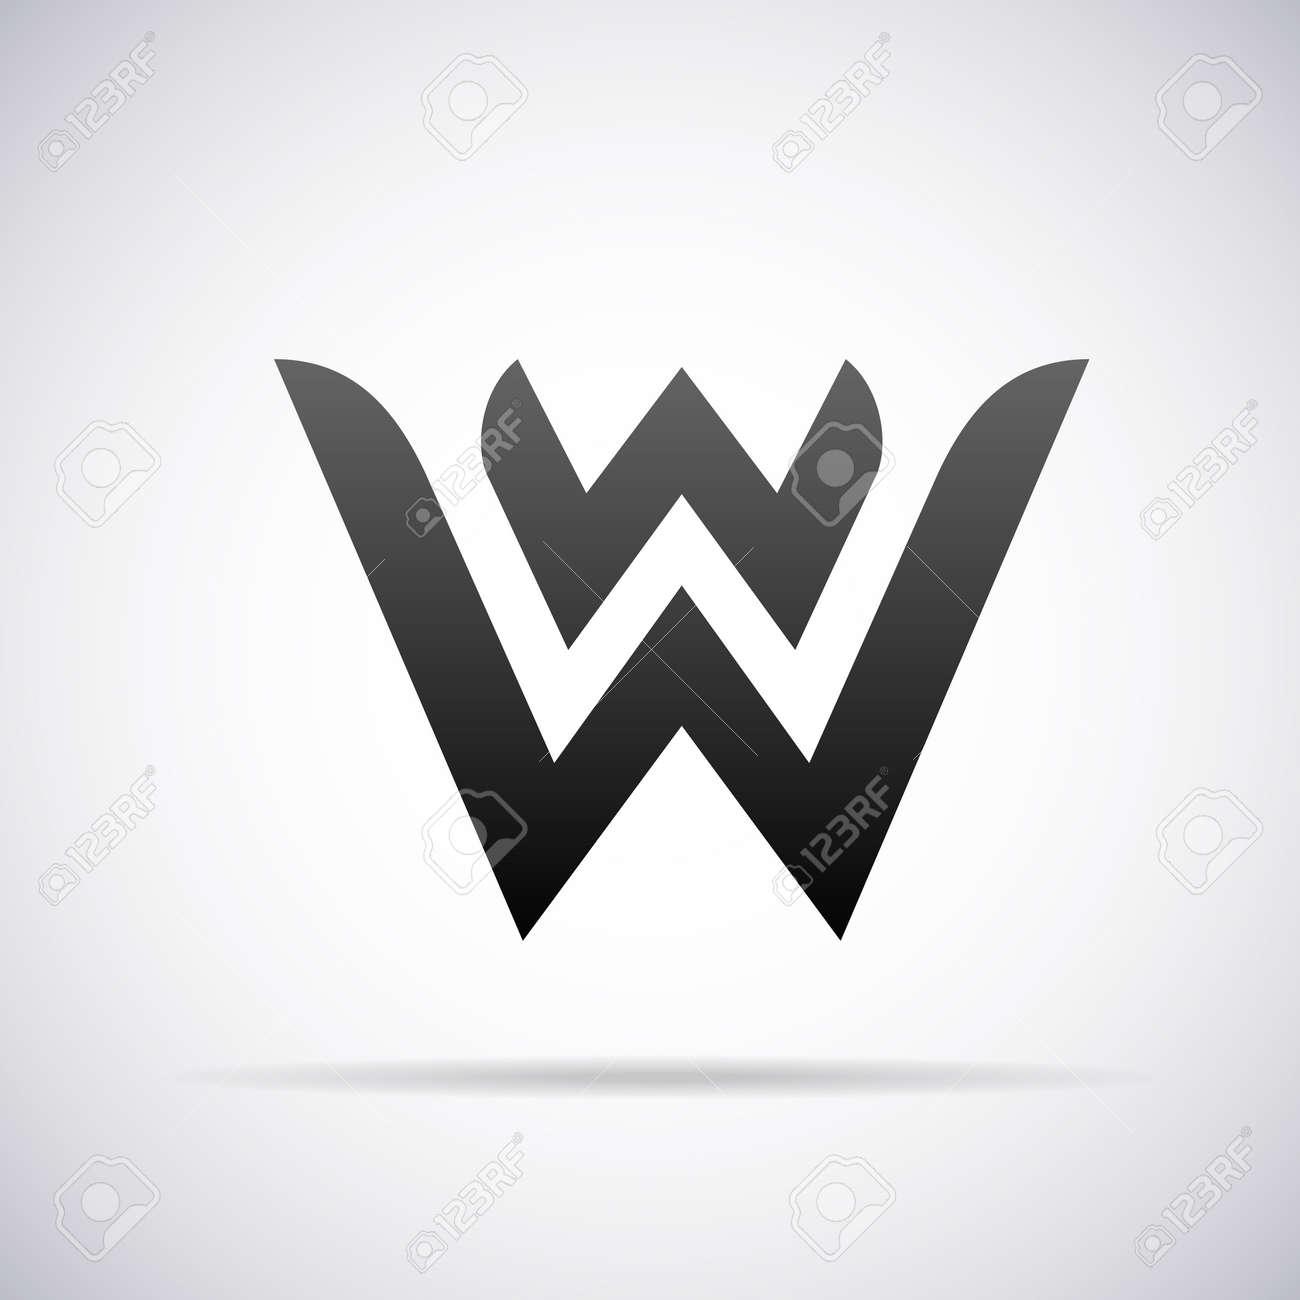 Logo For Letter W Design Template Vector Illustration Royalty Free